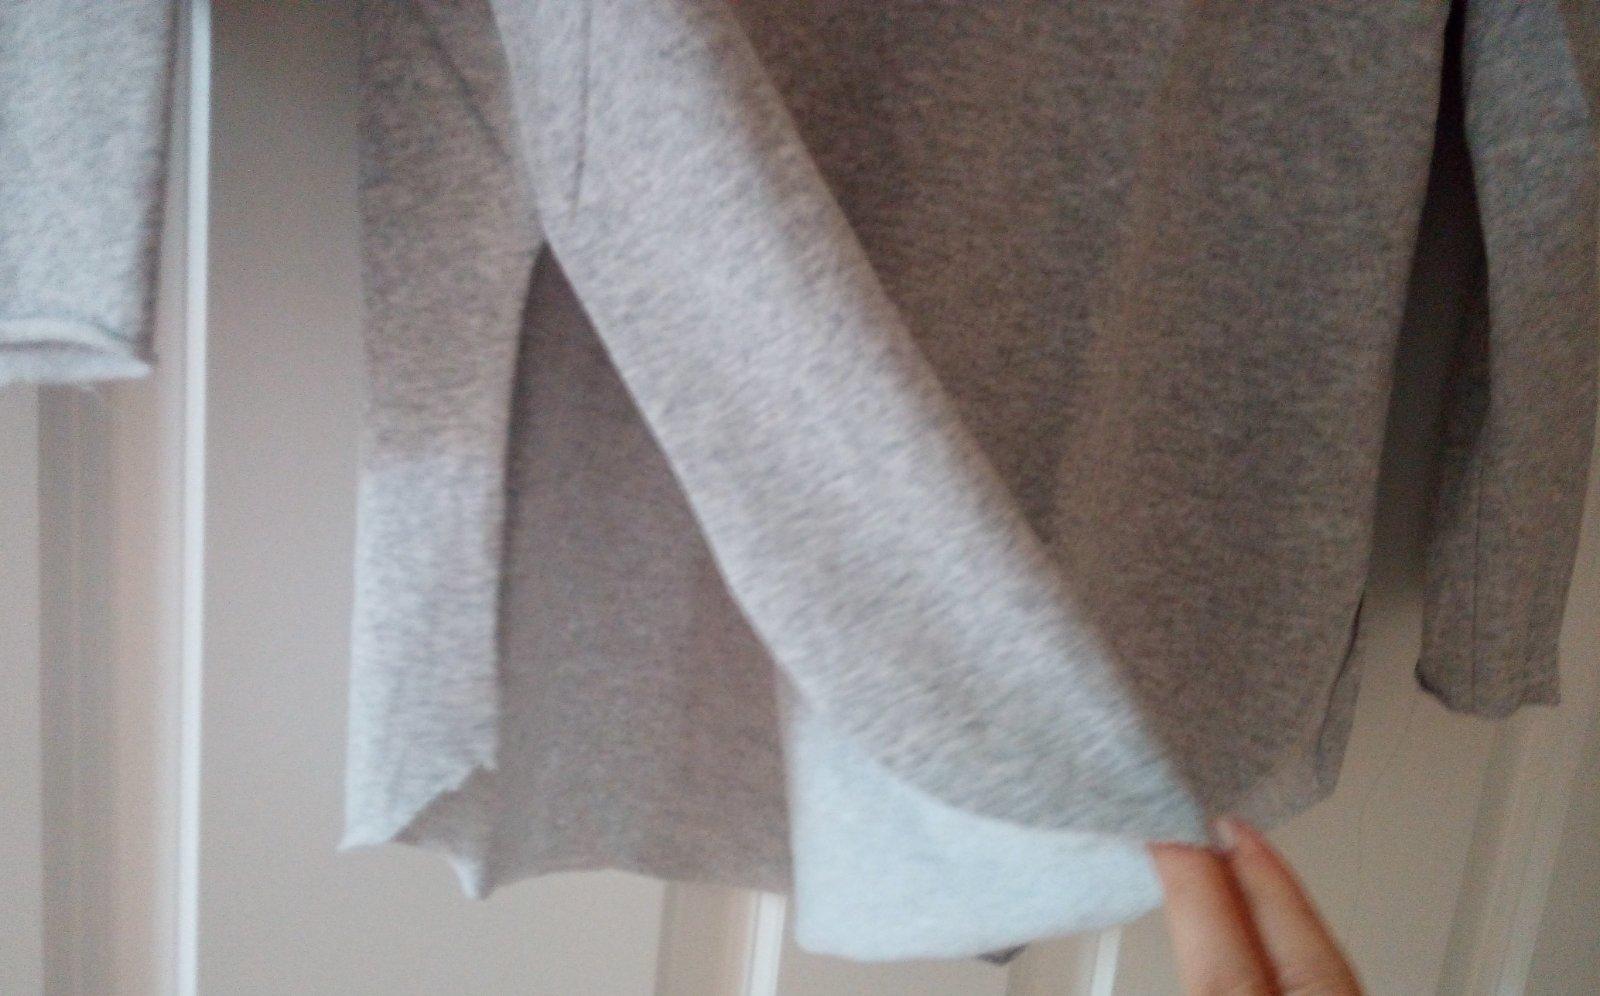 Sivá mikina/tričko S/M - Obrázok č. 2